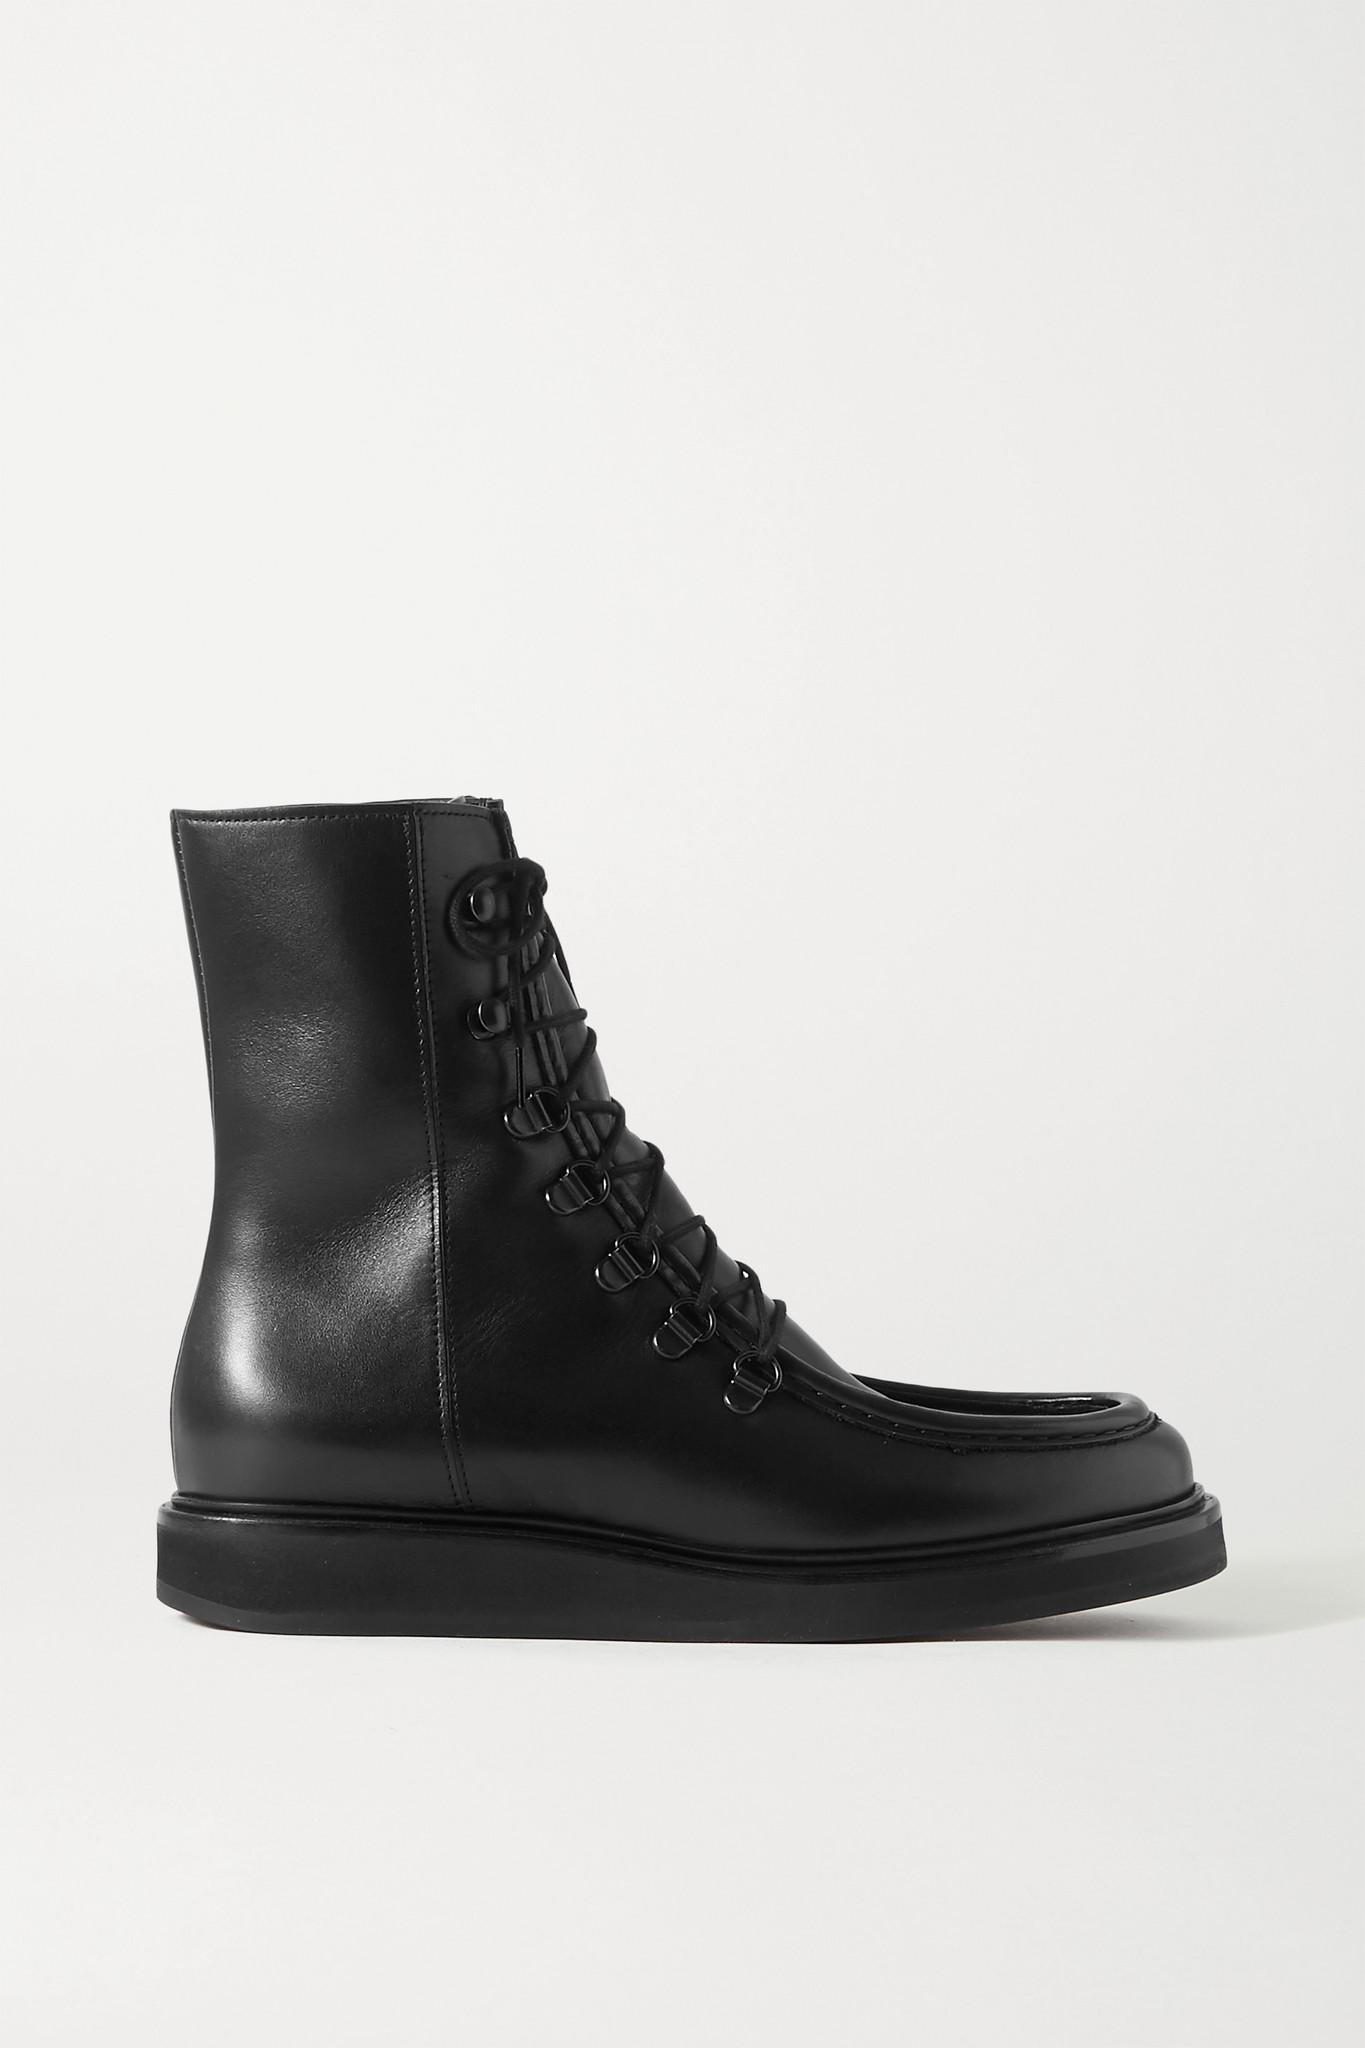 LEGRES - 16 皮革踝靴 - 黑色 - IT38